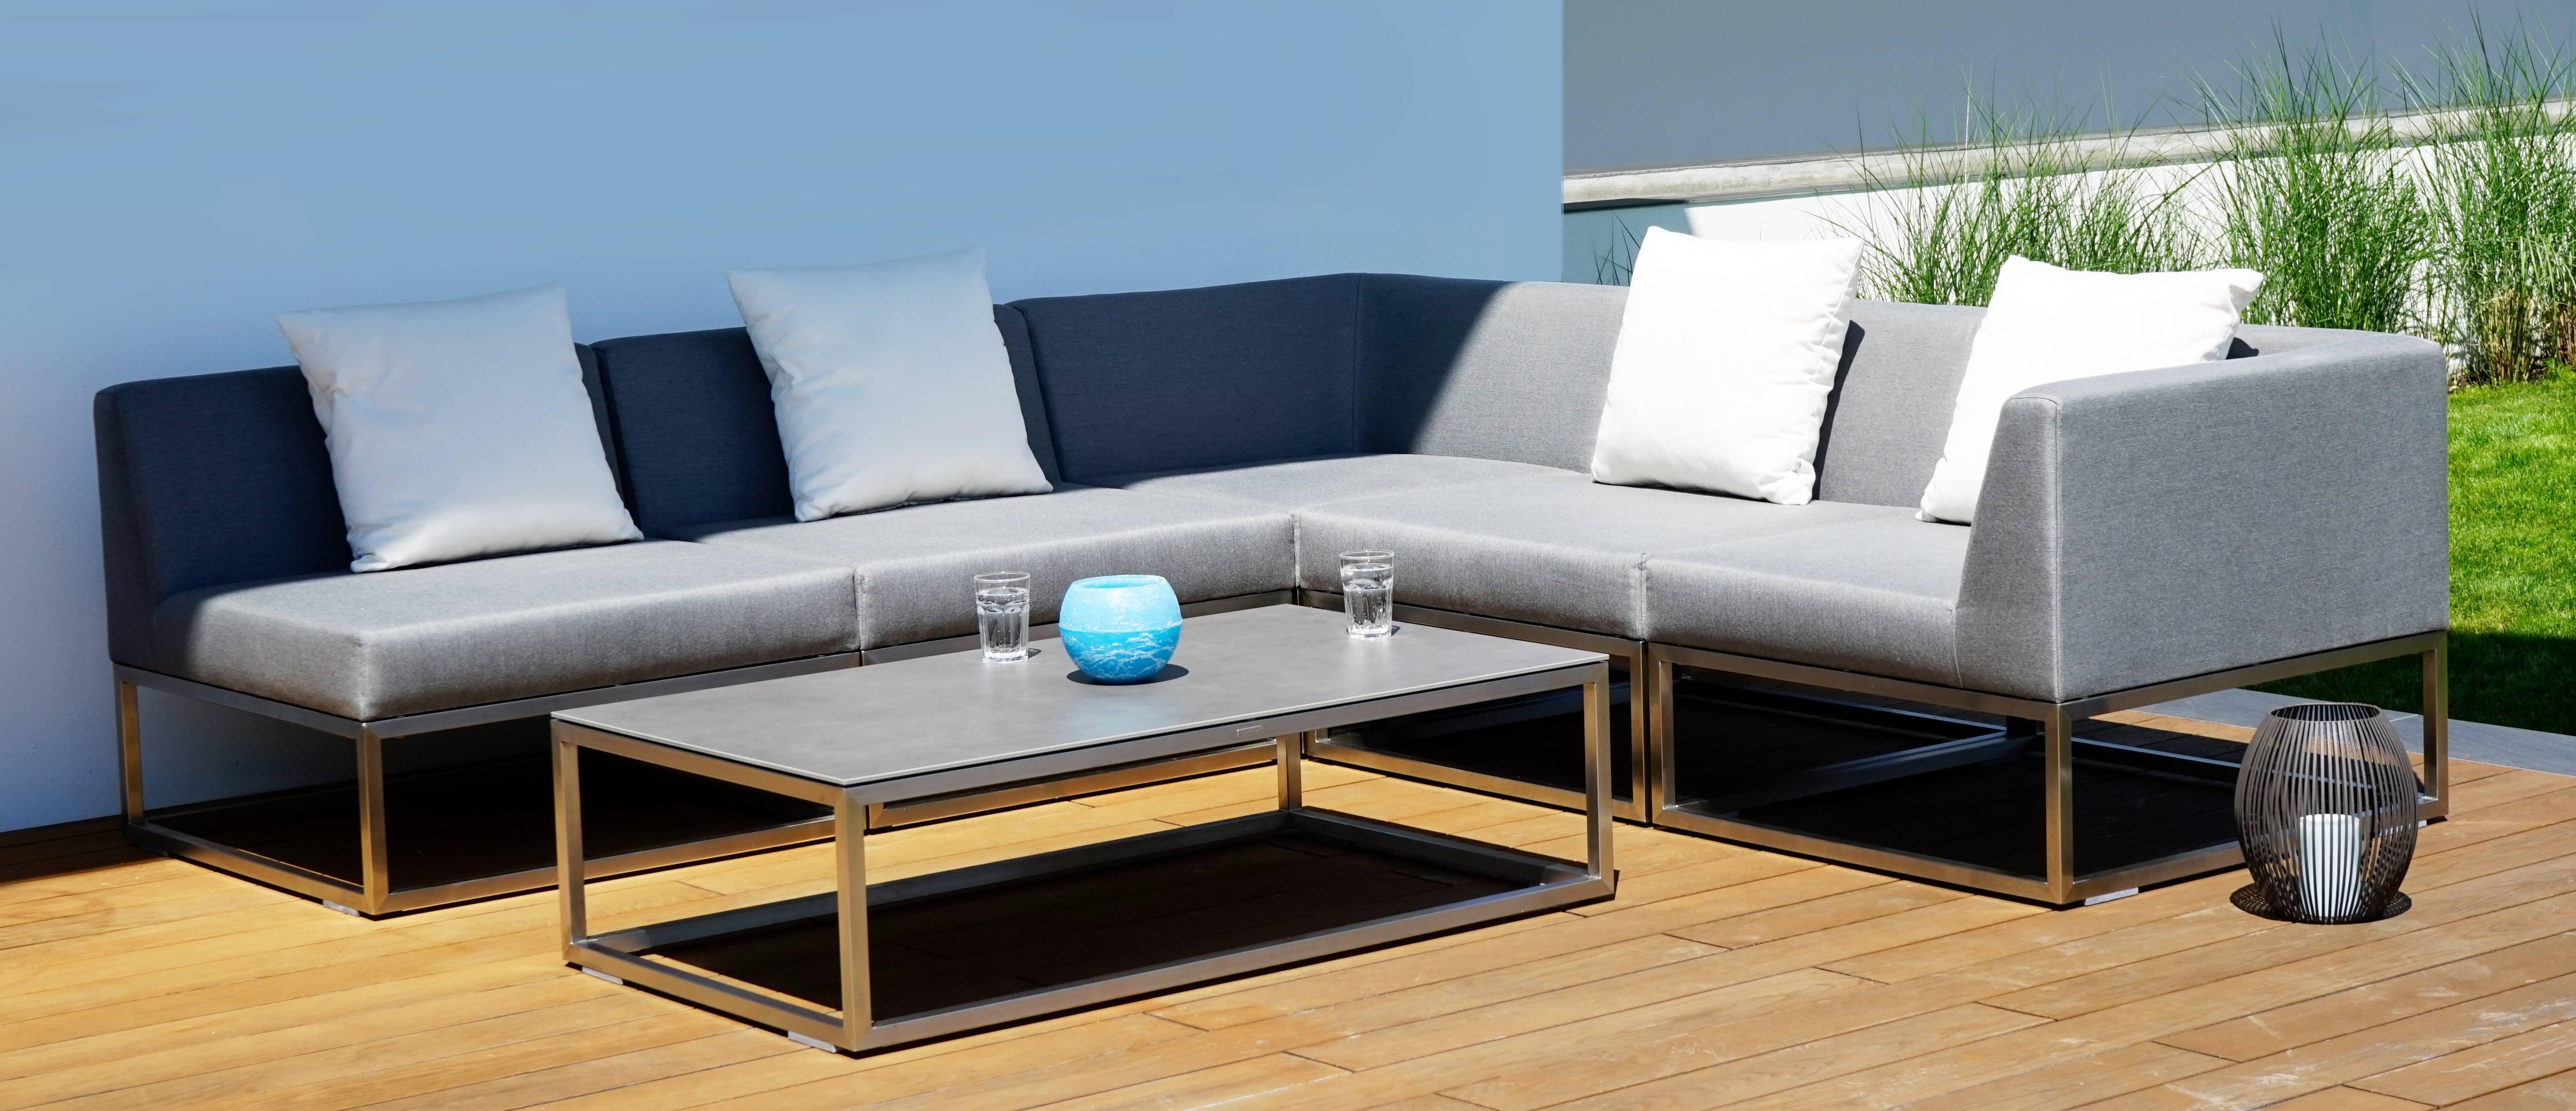 bahama lounge sunbrella erhart gartenm bel. Black Bedroom Furniture Sets. Home Design Ideas